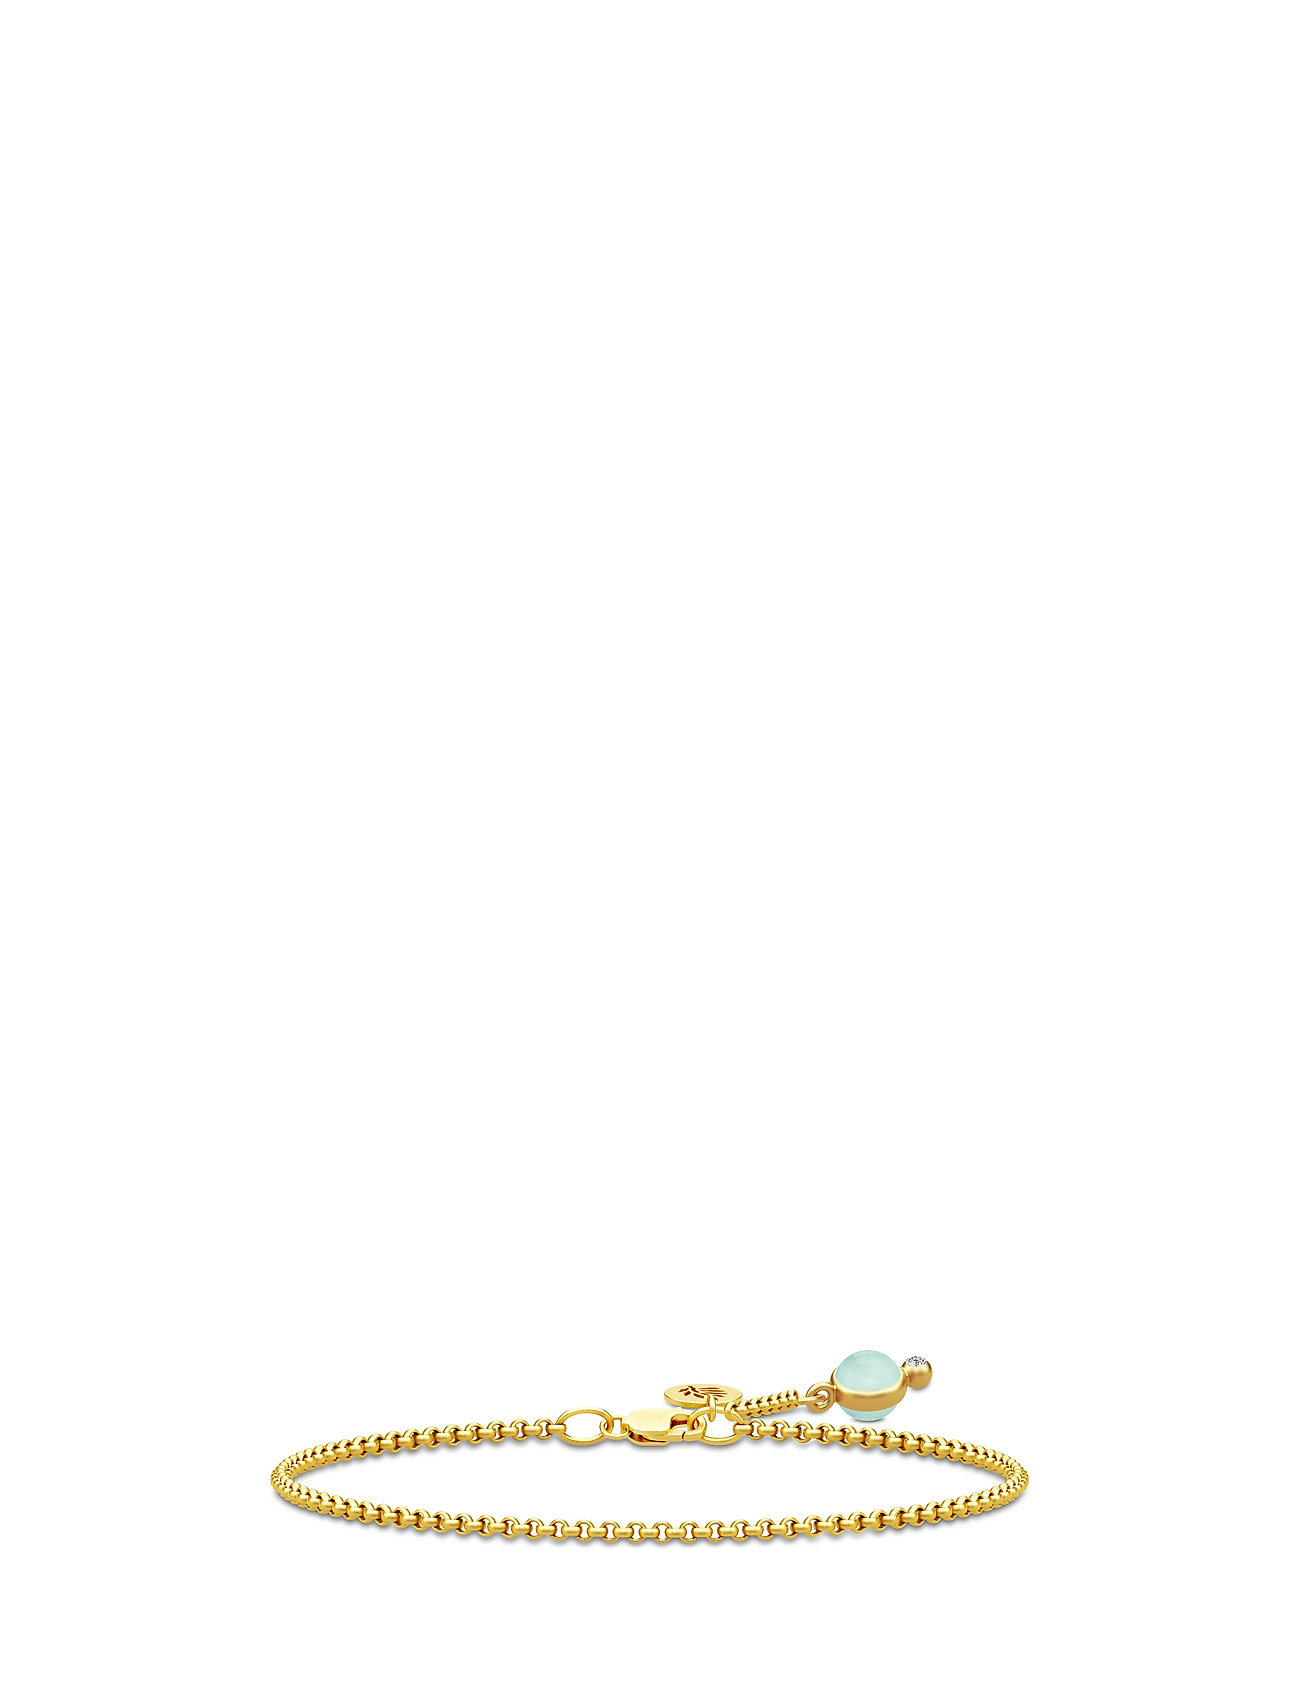 Prime Bracelet - Gold/Peony Chalcedony Julie Sandlau Smykker til Damer i Grøn